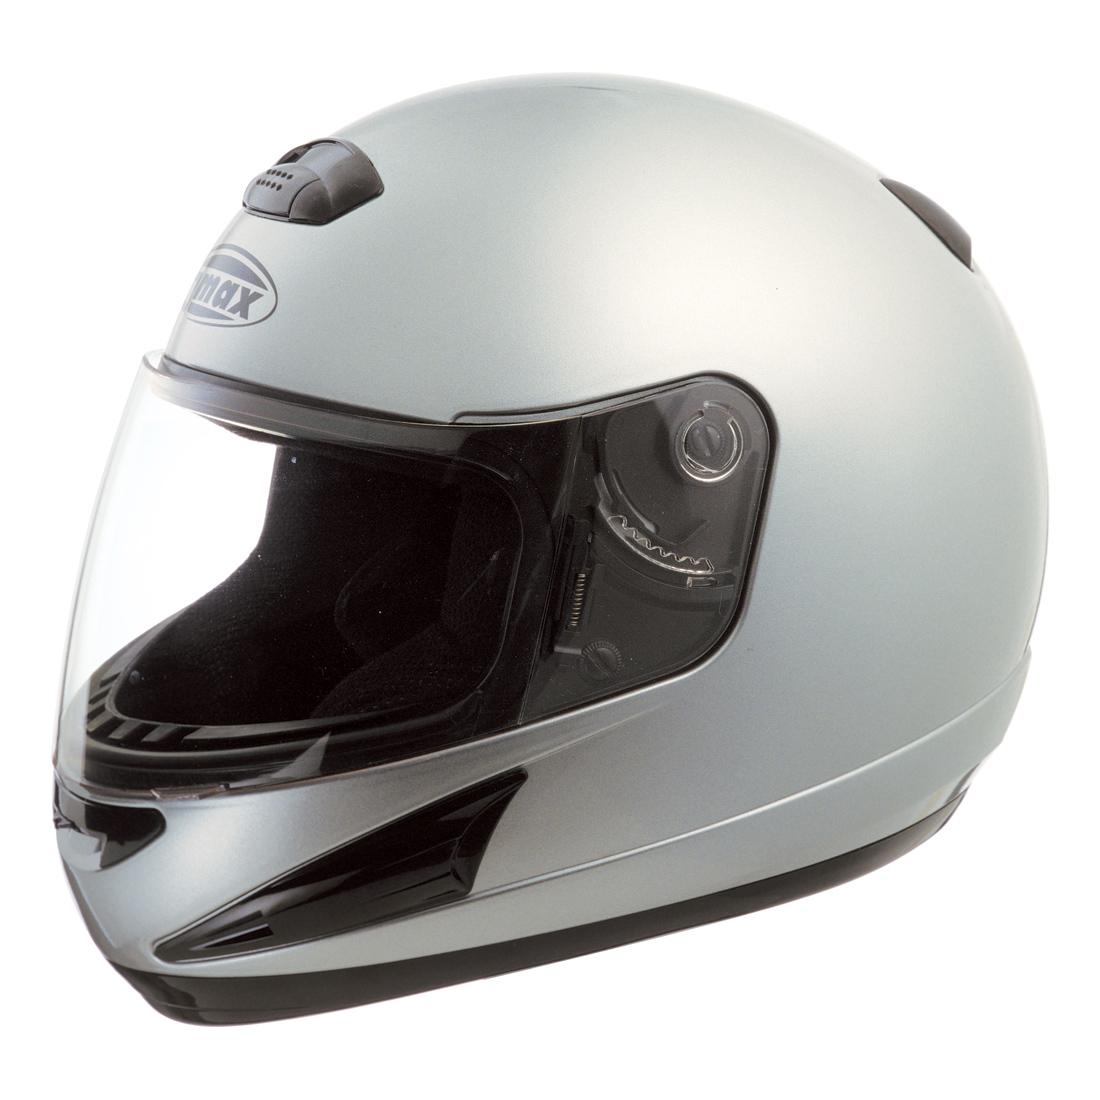 GMAX GM38 Dark Metallic Silver Full Face Helmet